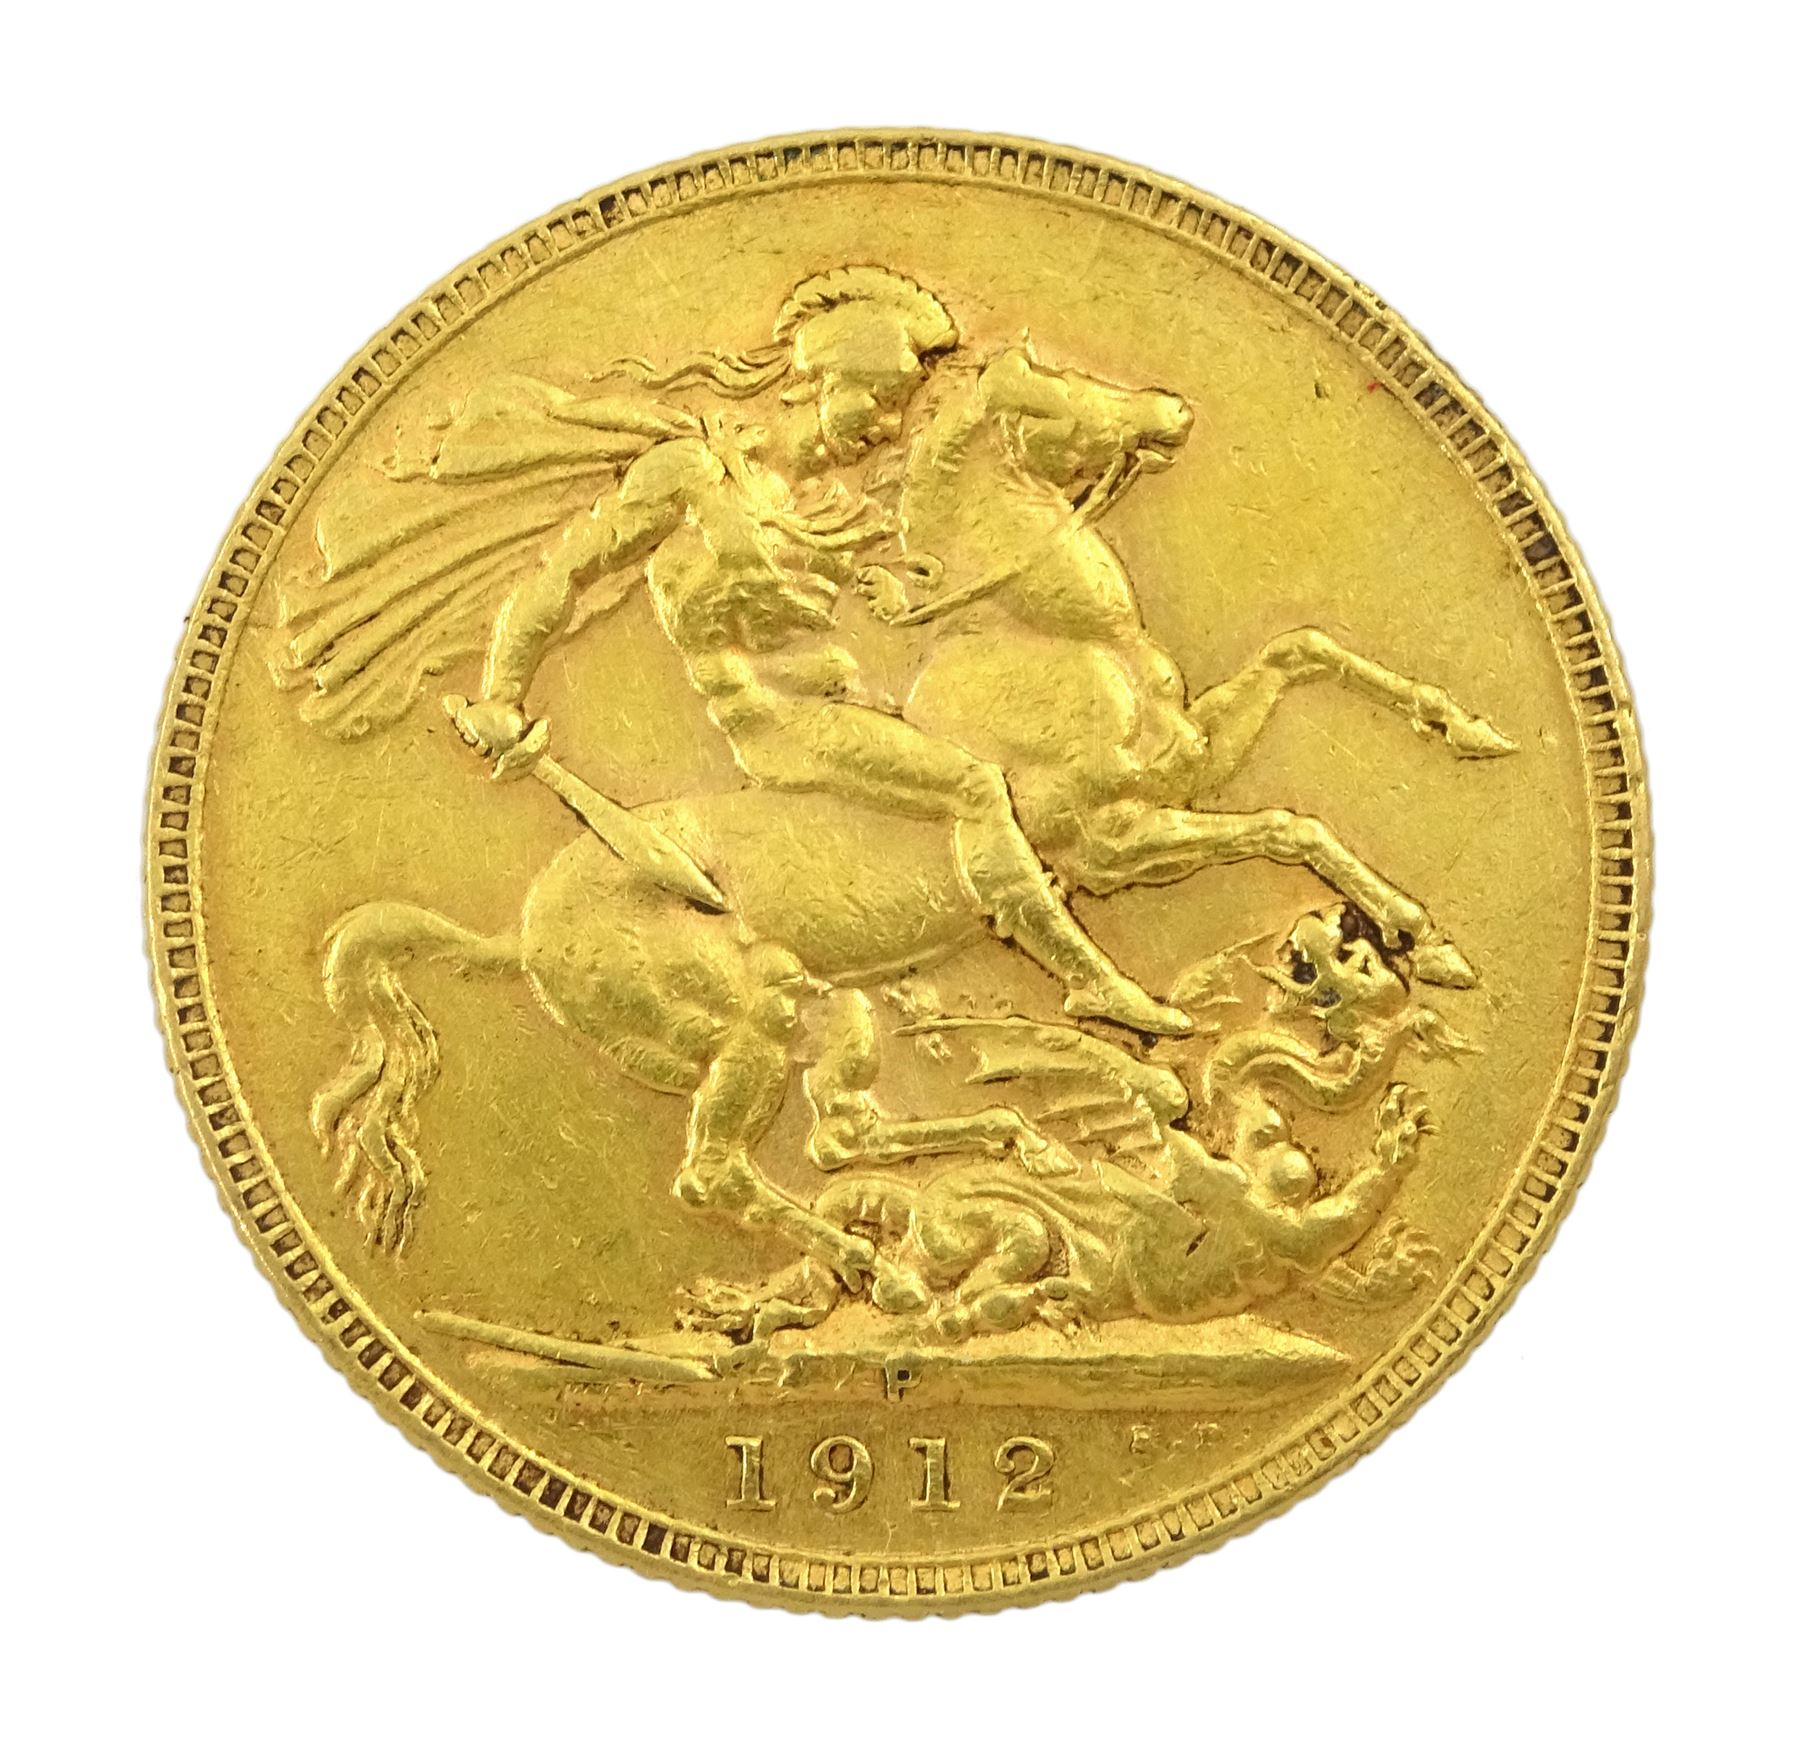 King George V 1912 gold full sovereign coin - Image 2 of 2